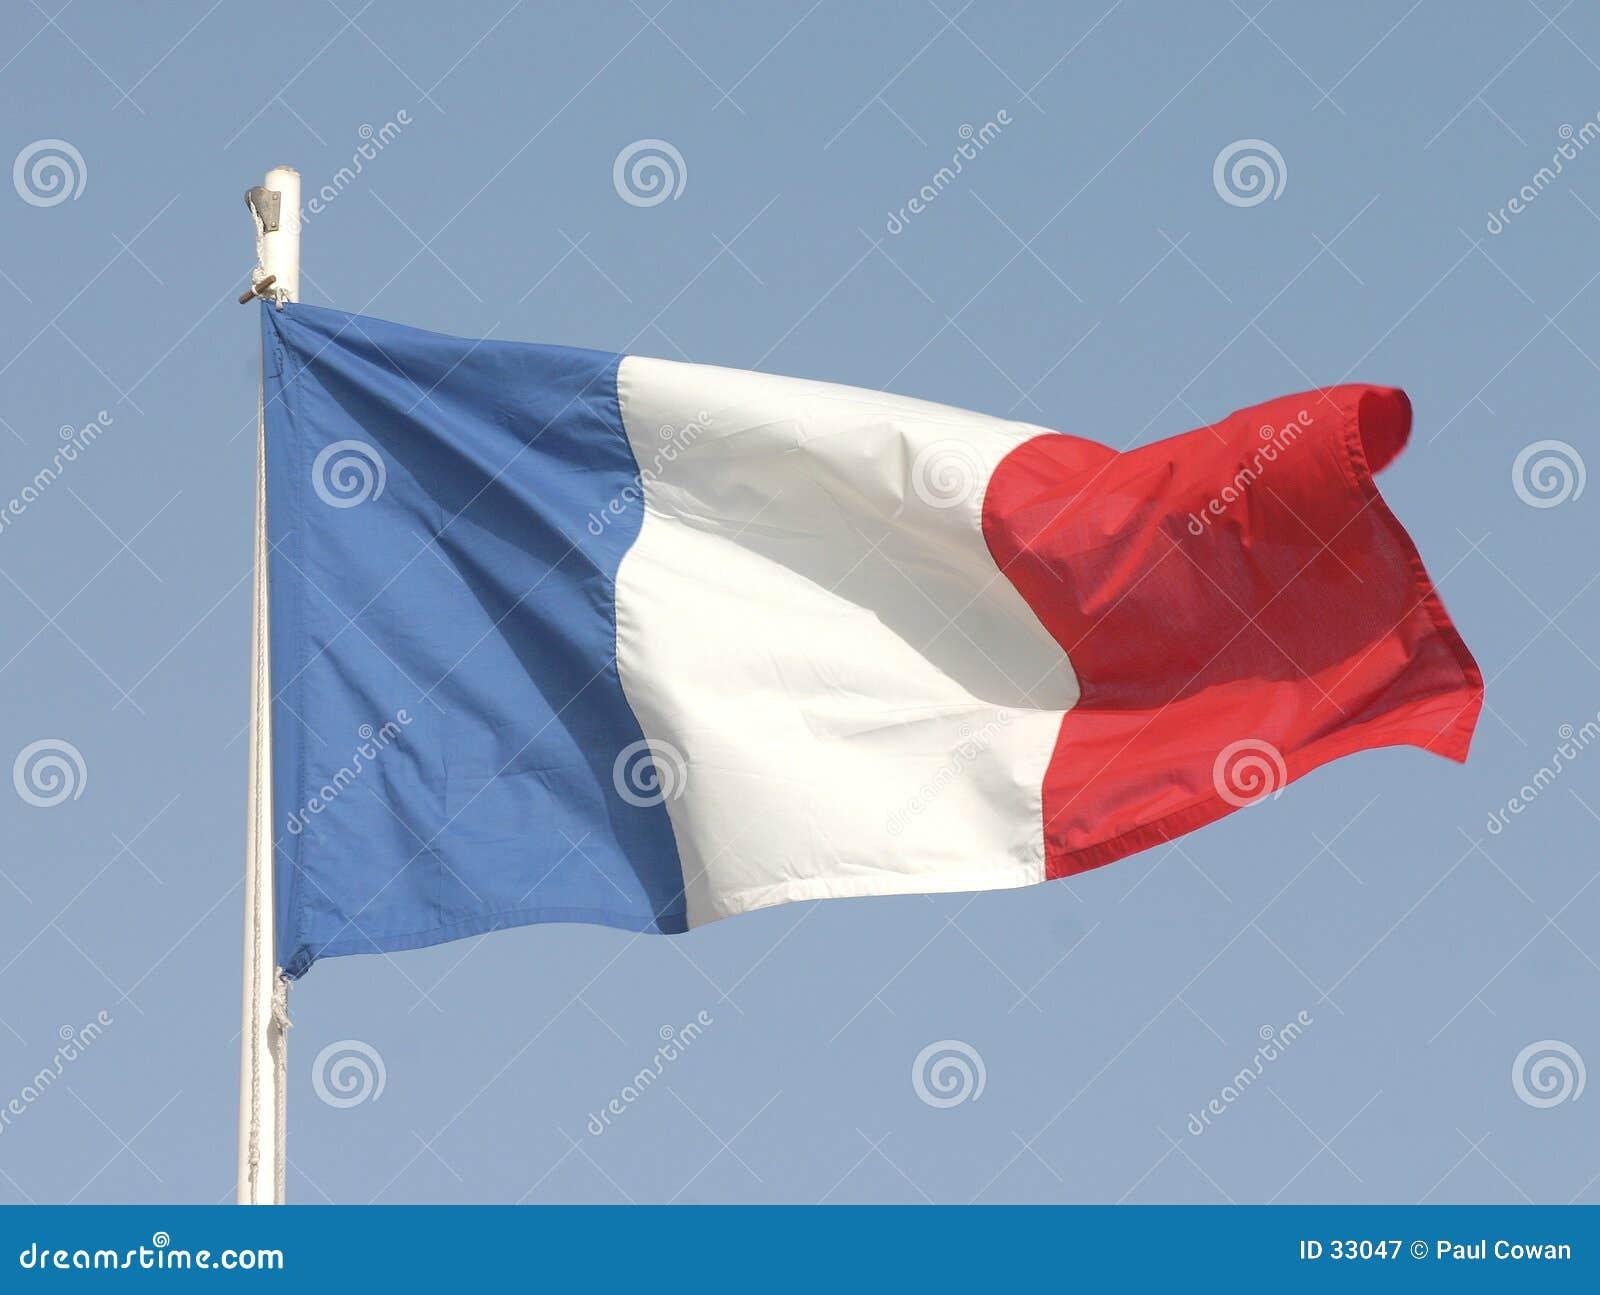 Download Indicador francés imagen de archivo. Imagen de francaise - 33047